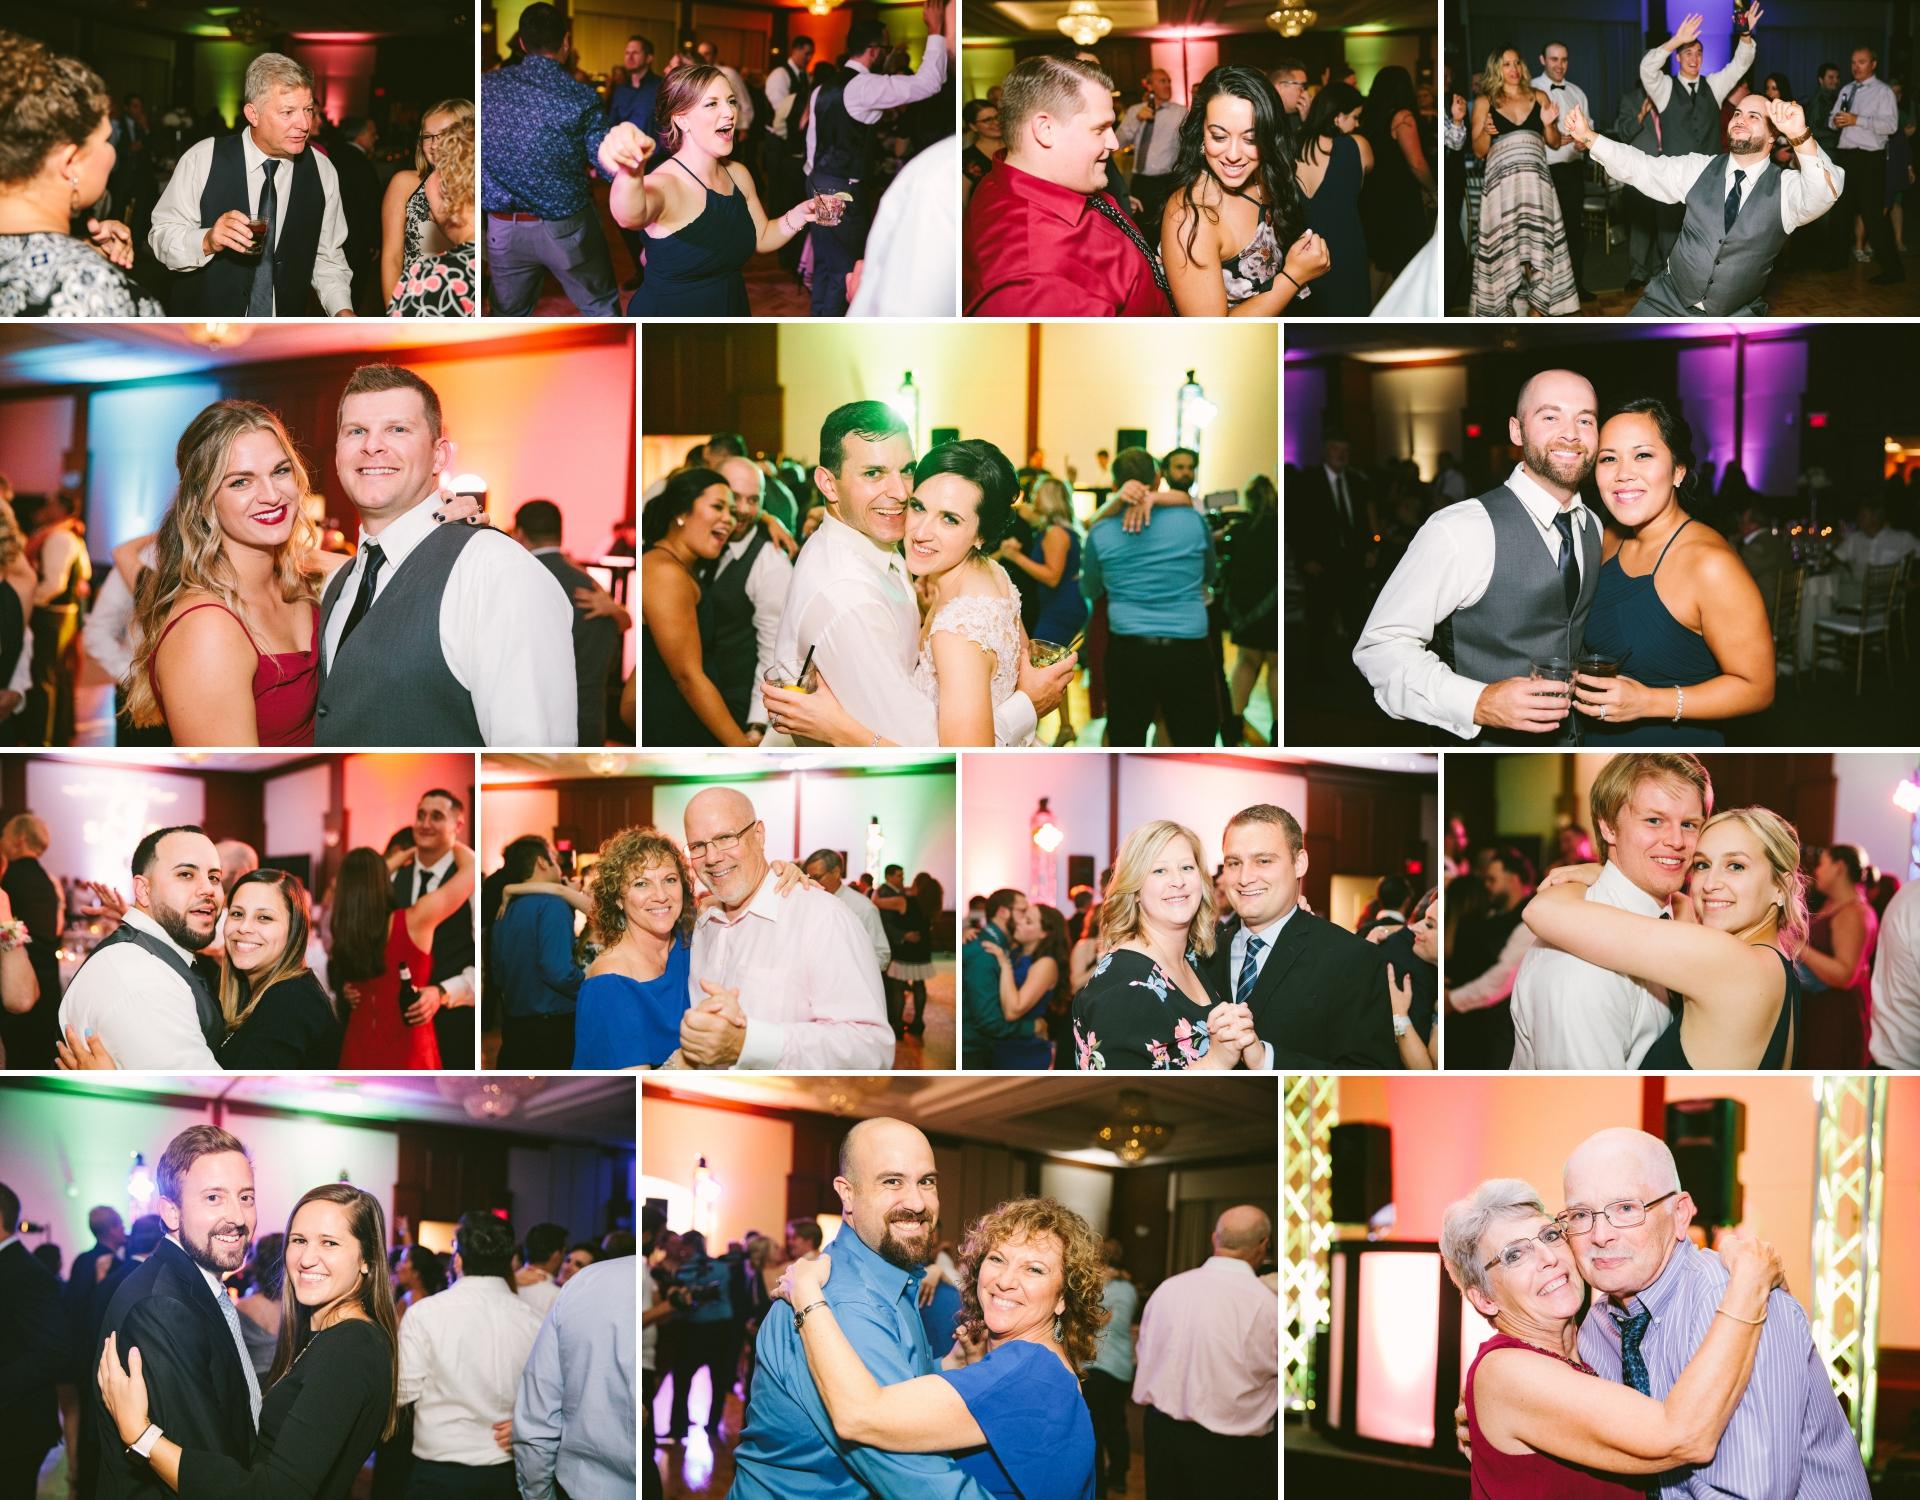 Intercontinental Hotel Wedding in Cleveland 2 45.jpg